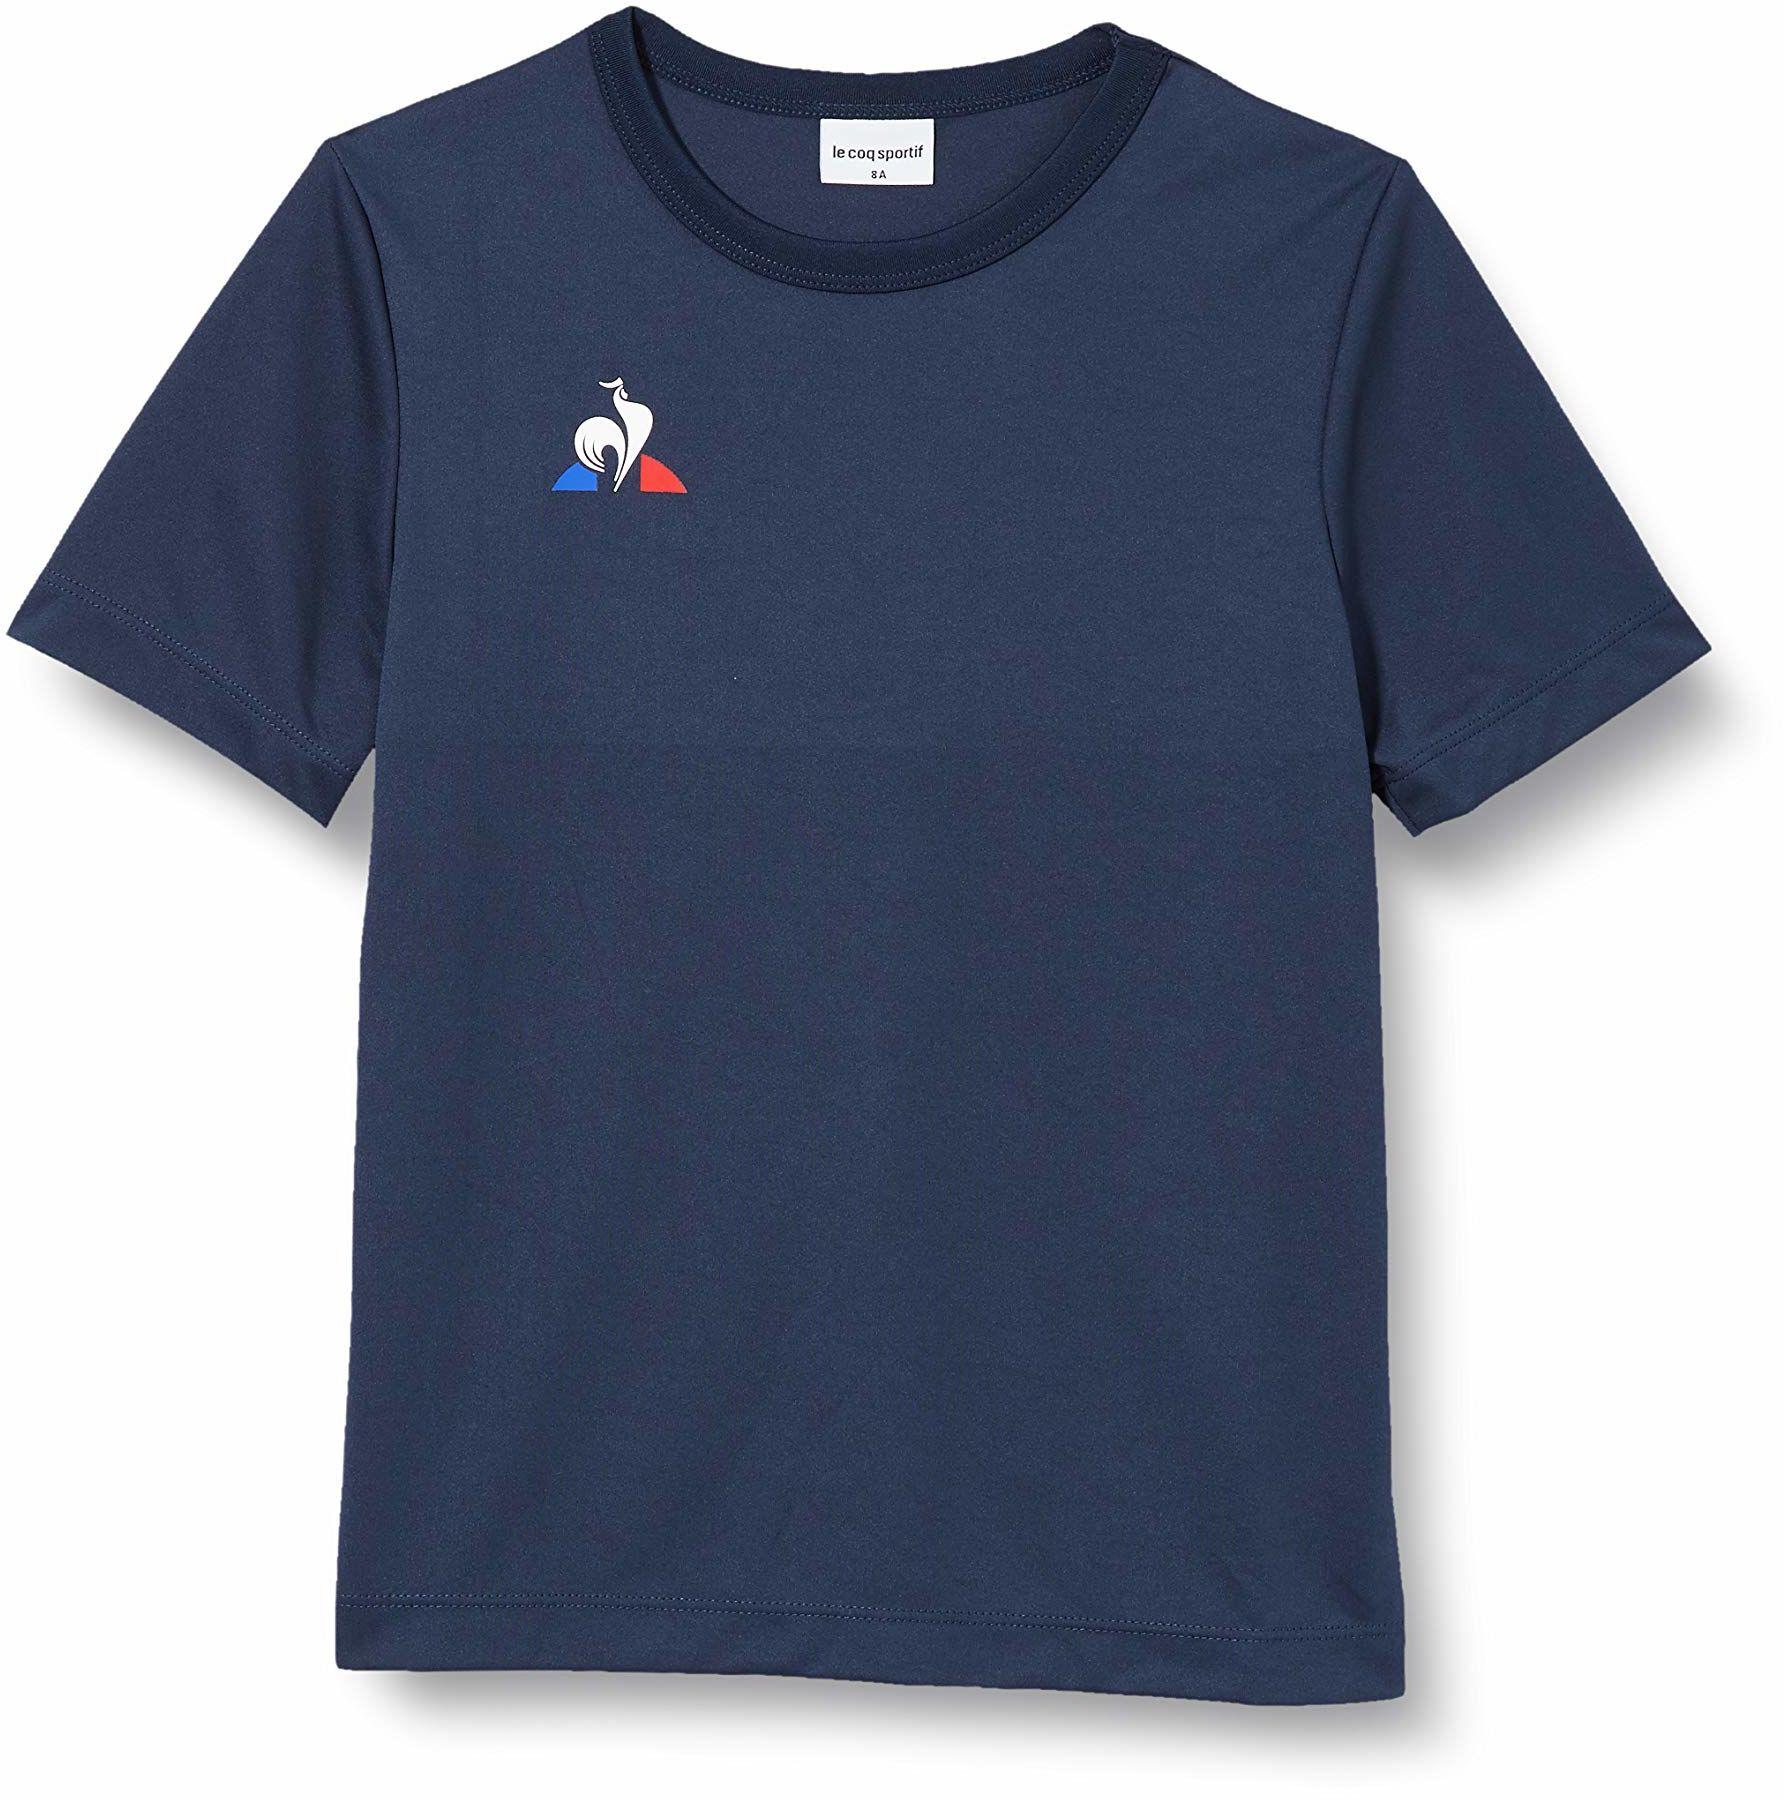 Le Coq Sportif N 1 Maillot Match Enfant Mc podkoszulek, niebieski (Dress Blues), 10A